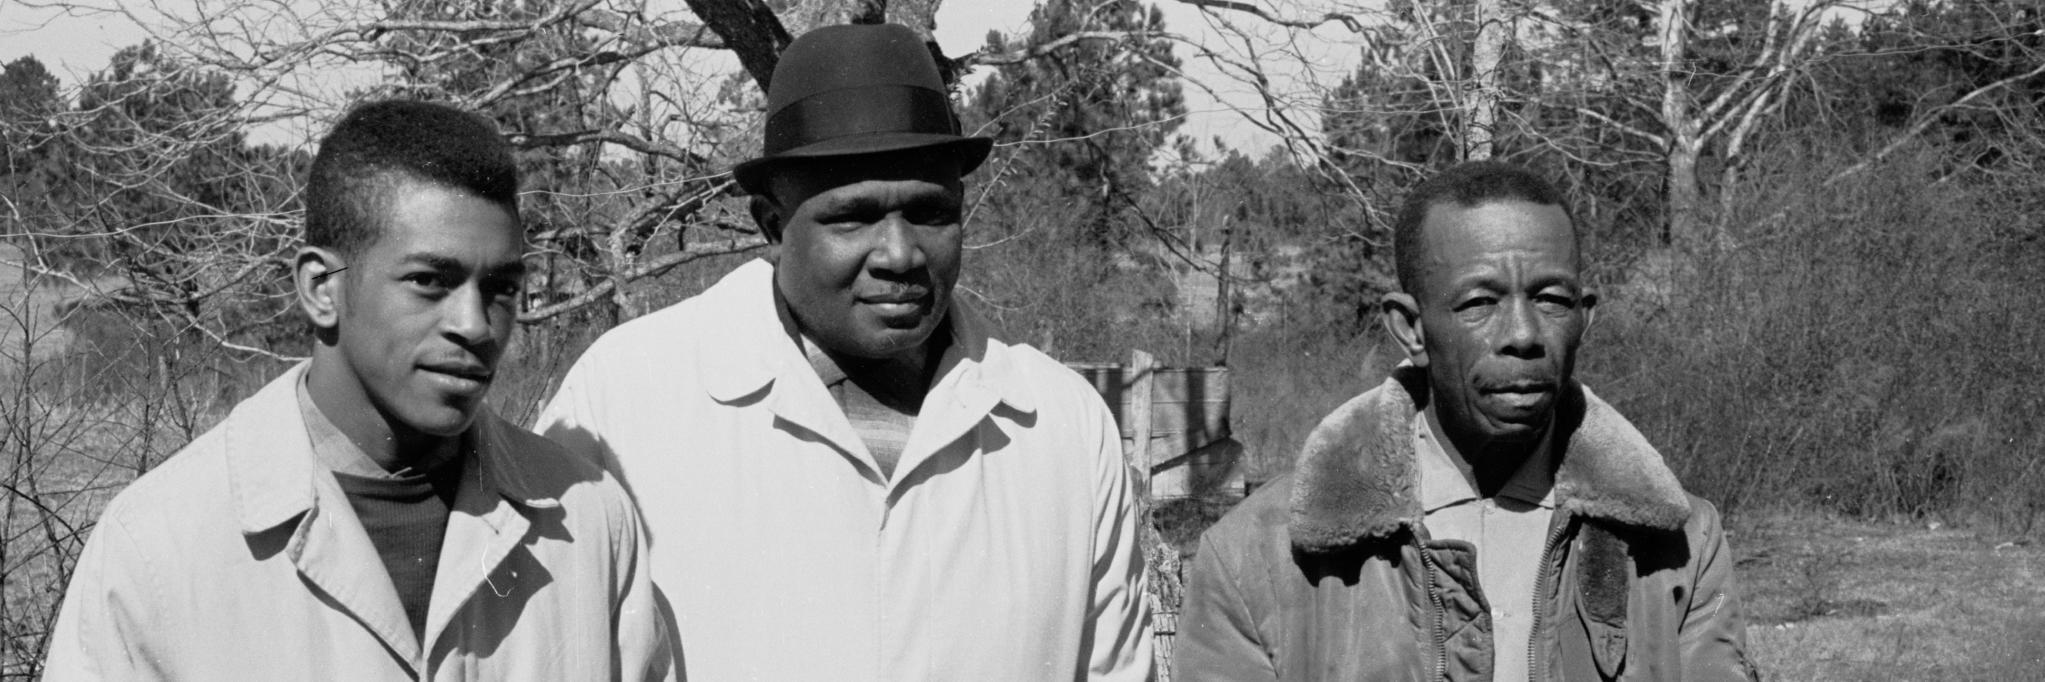 1963, Mississippi Voter Registration Activists Hollis Watkins, Amzie Moore, E.W. Steptoe,